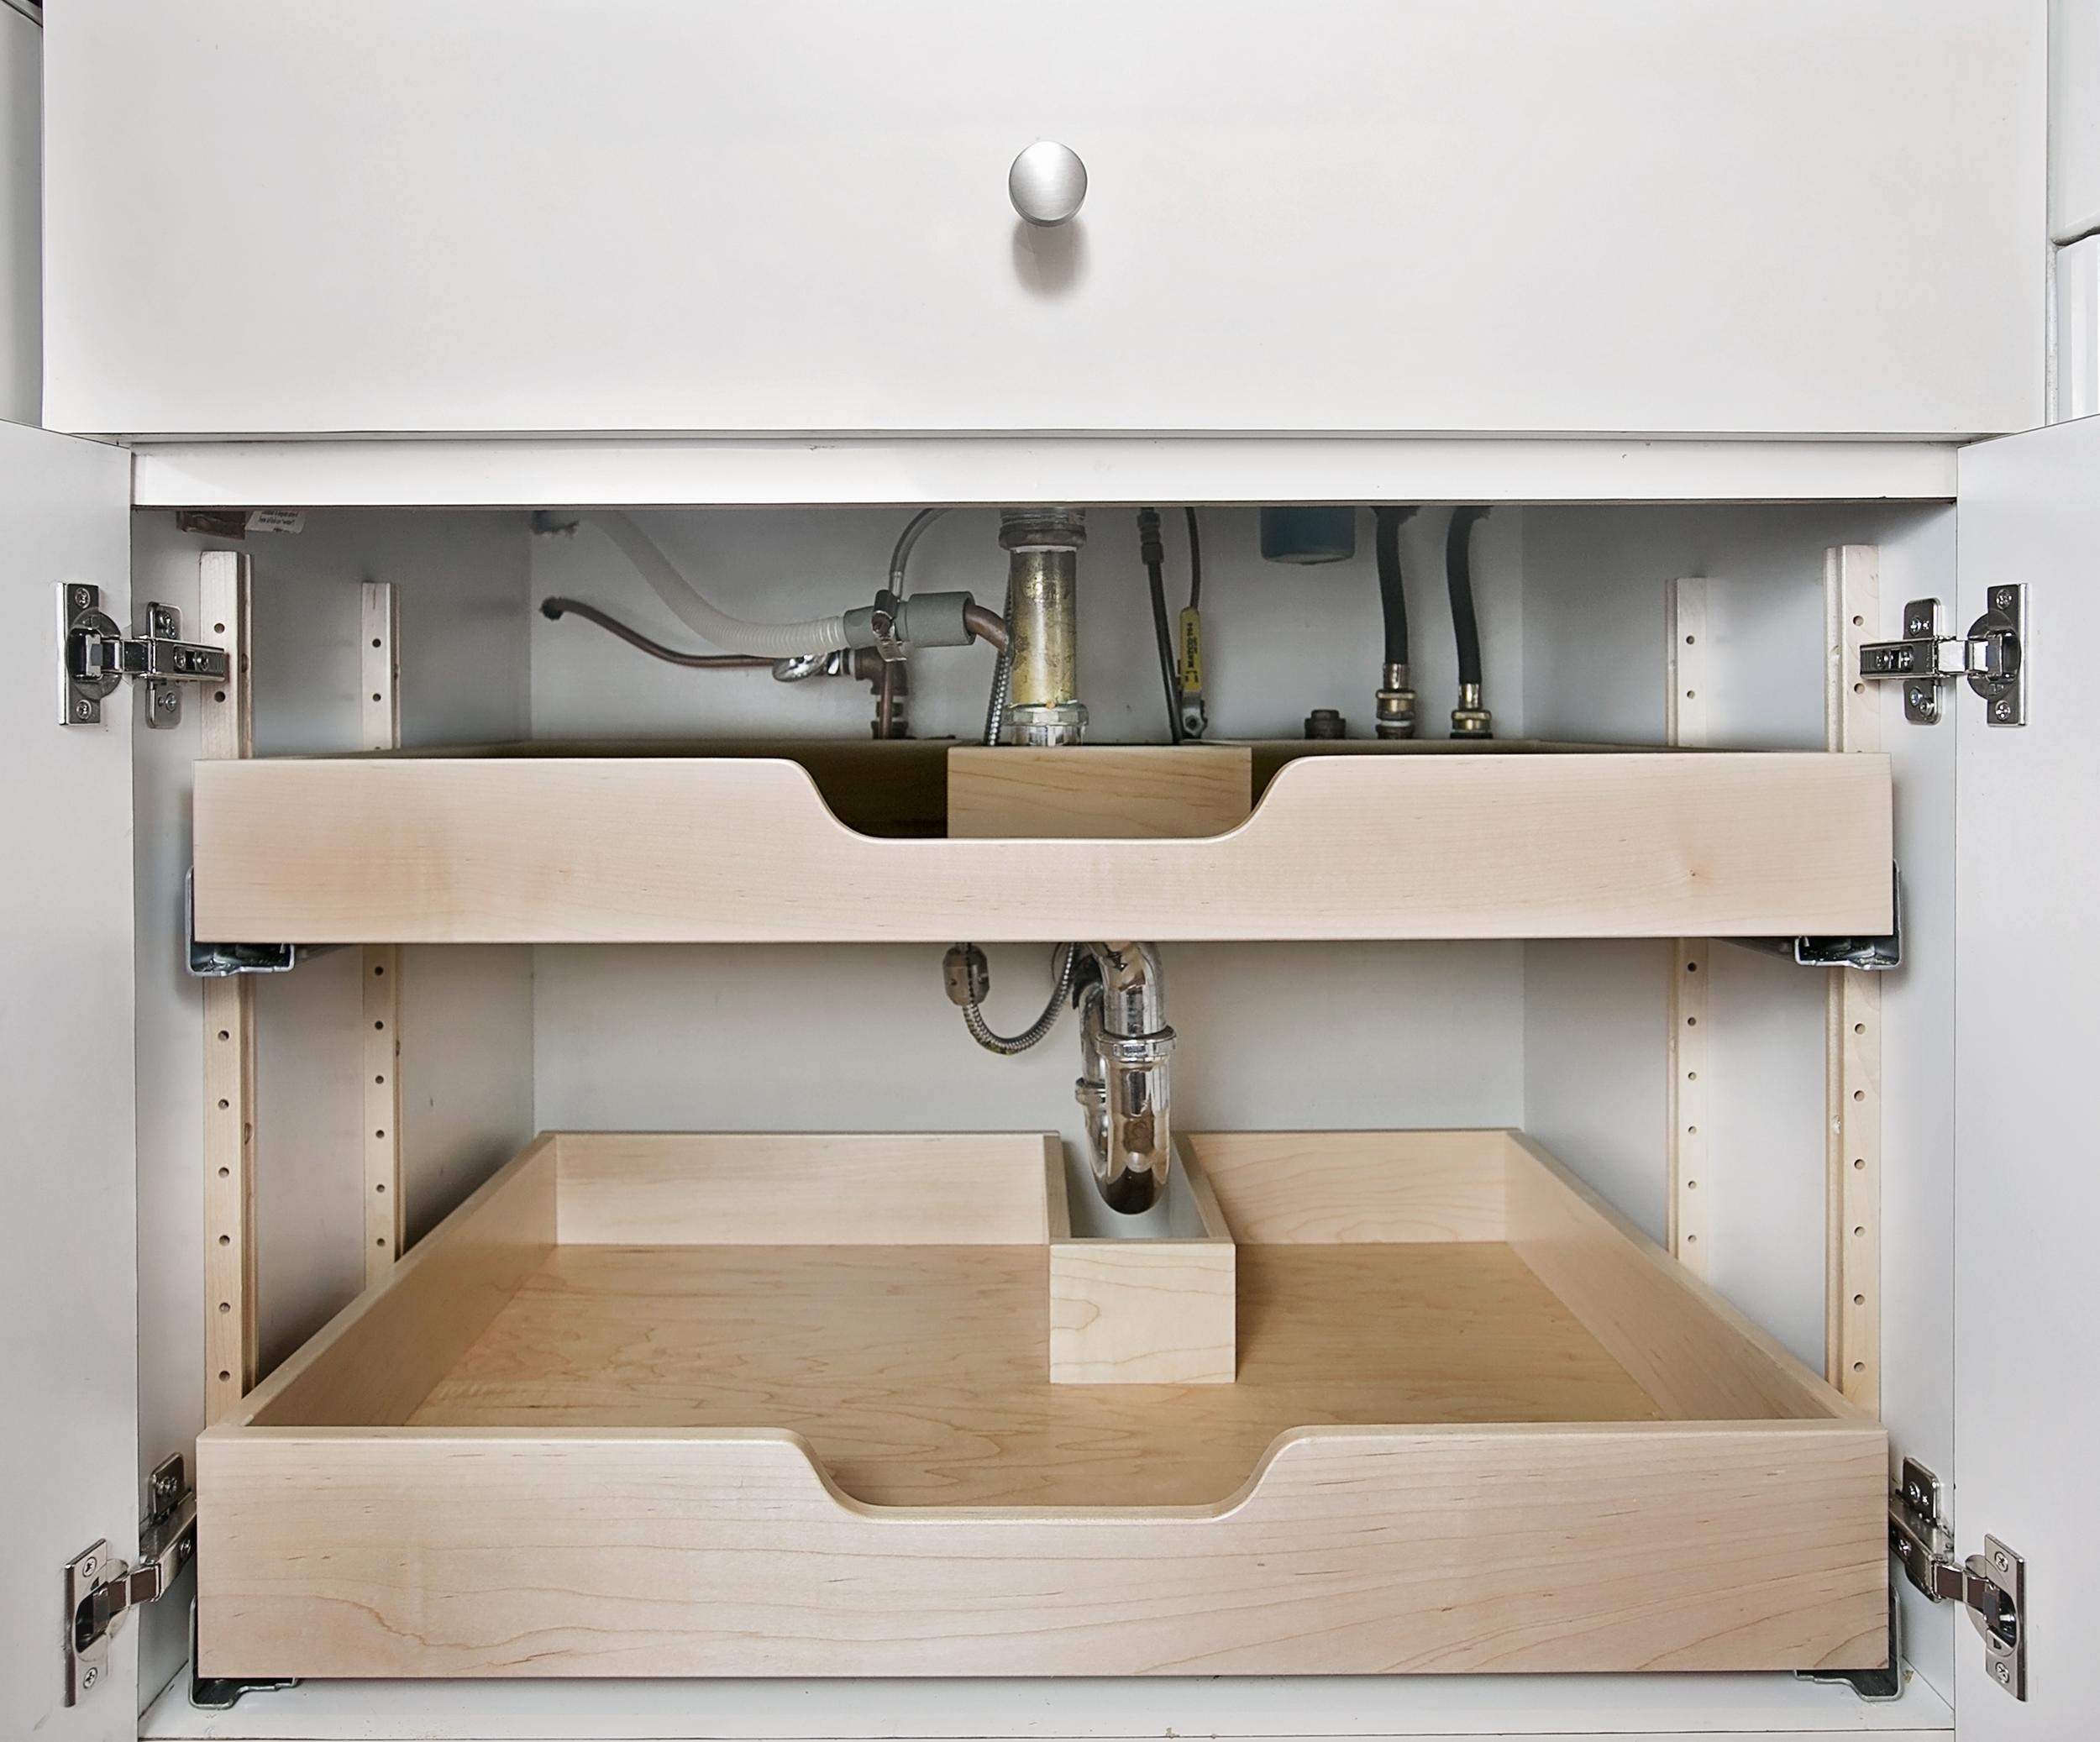 vanity sink drawers - Our custom drawers work around your plumbing.